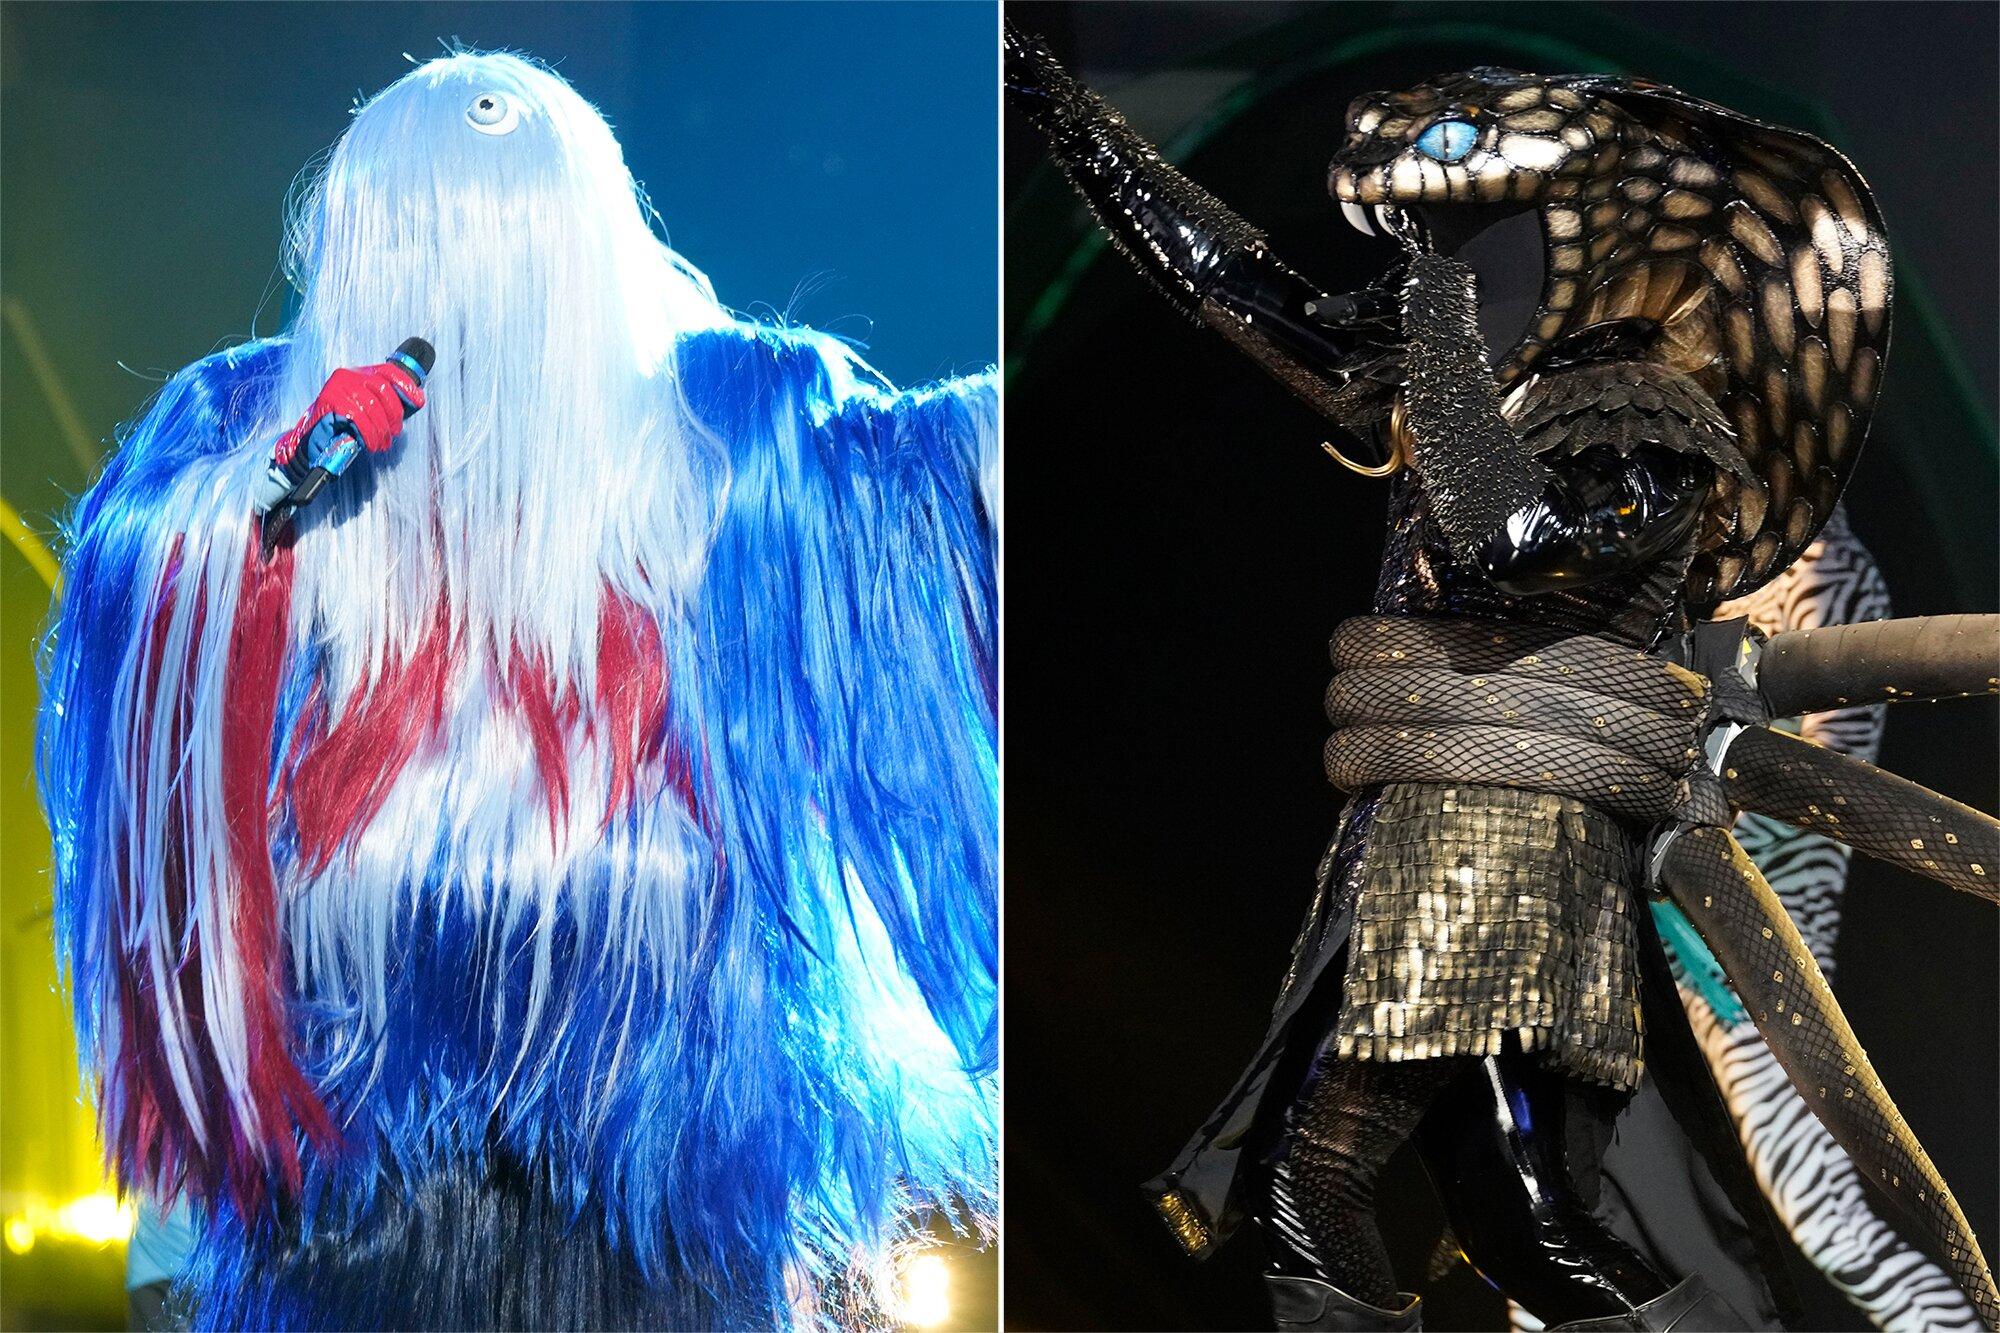 Masked Singer recap: Whatchamacallit and Serpent revealed | EW.com